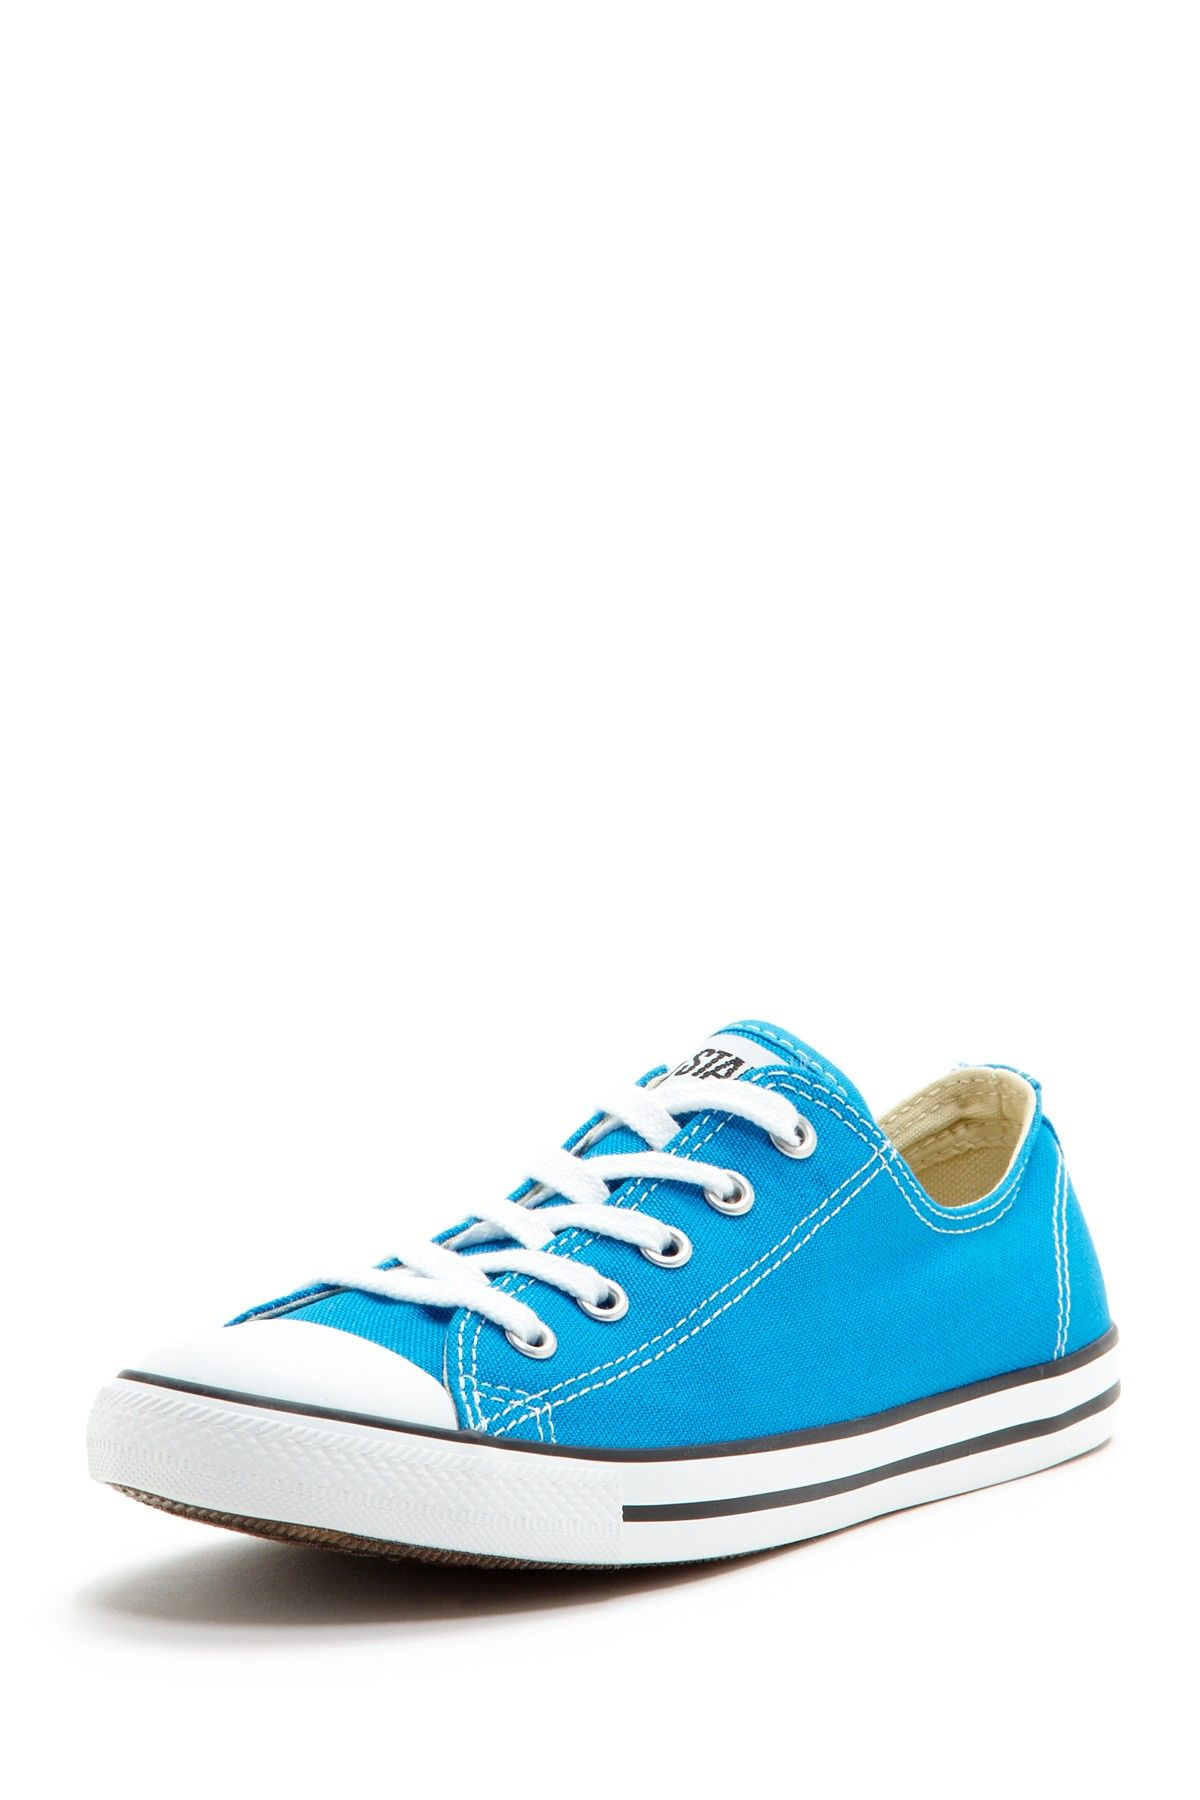 zapatillas converse azul electrico